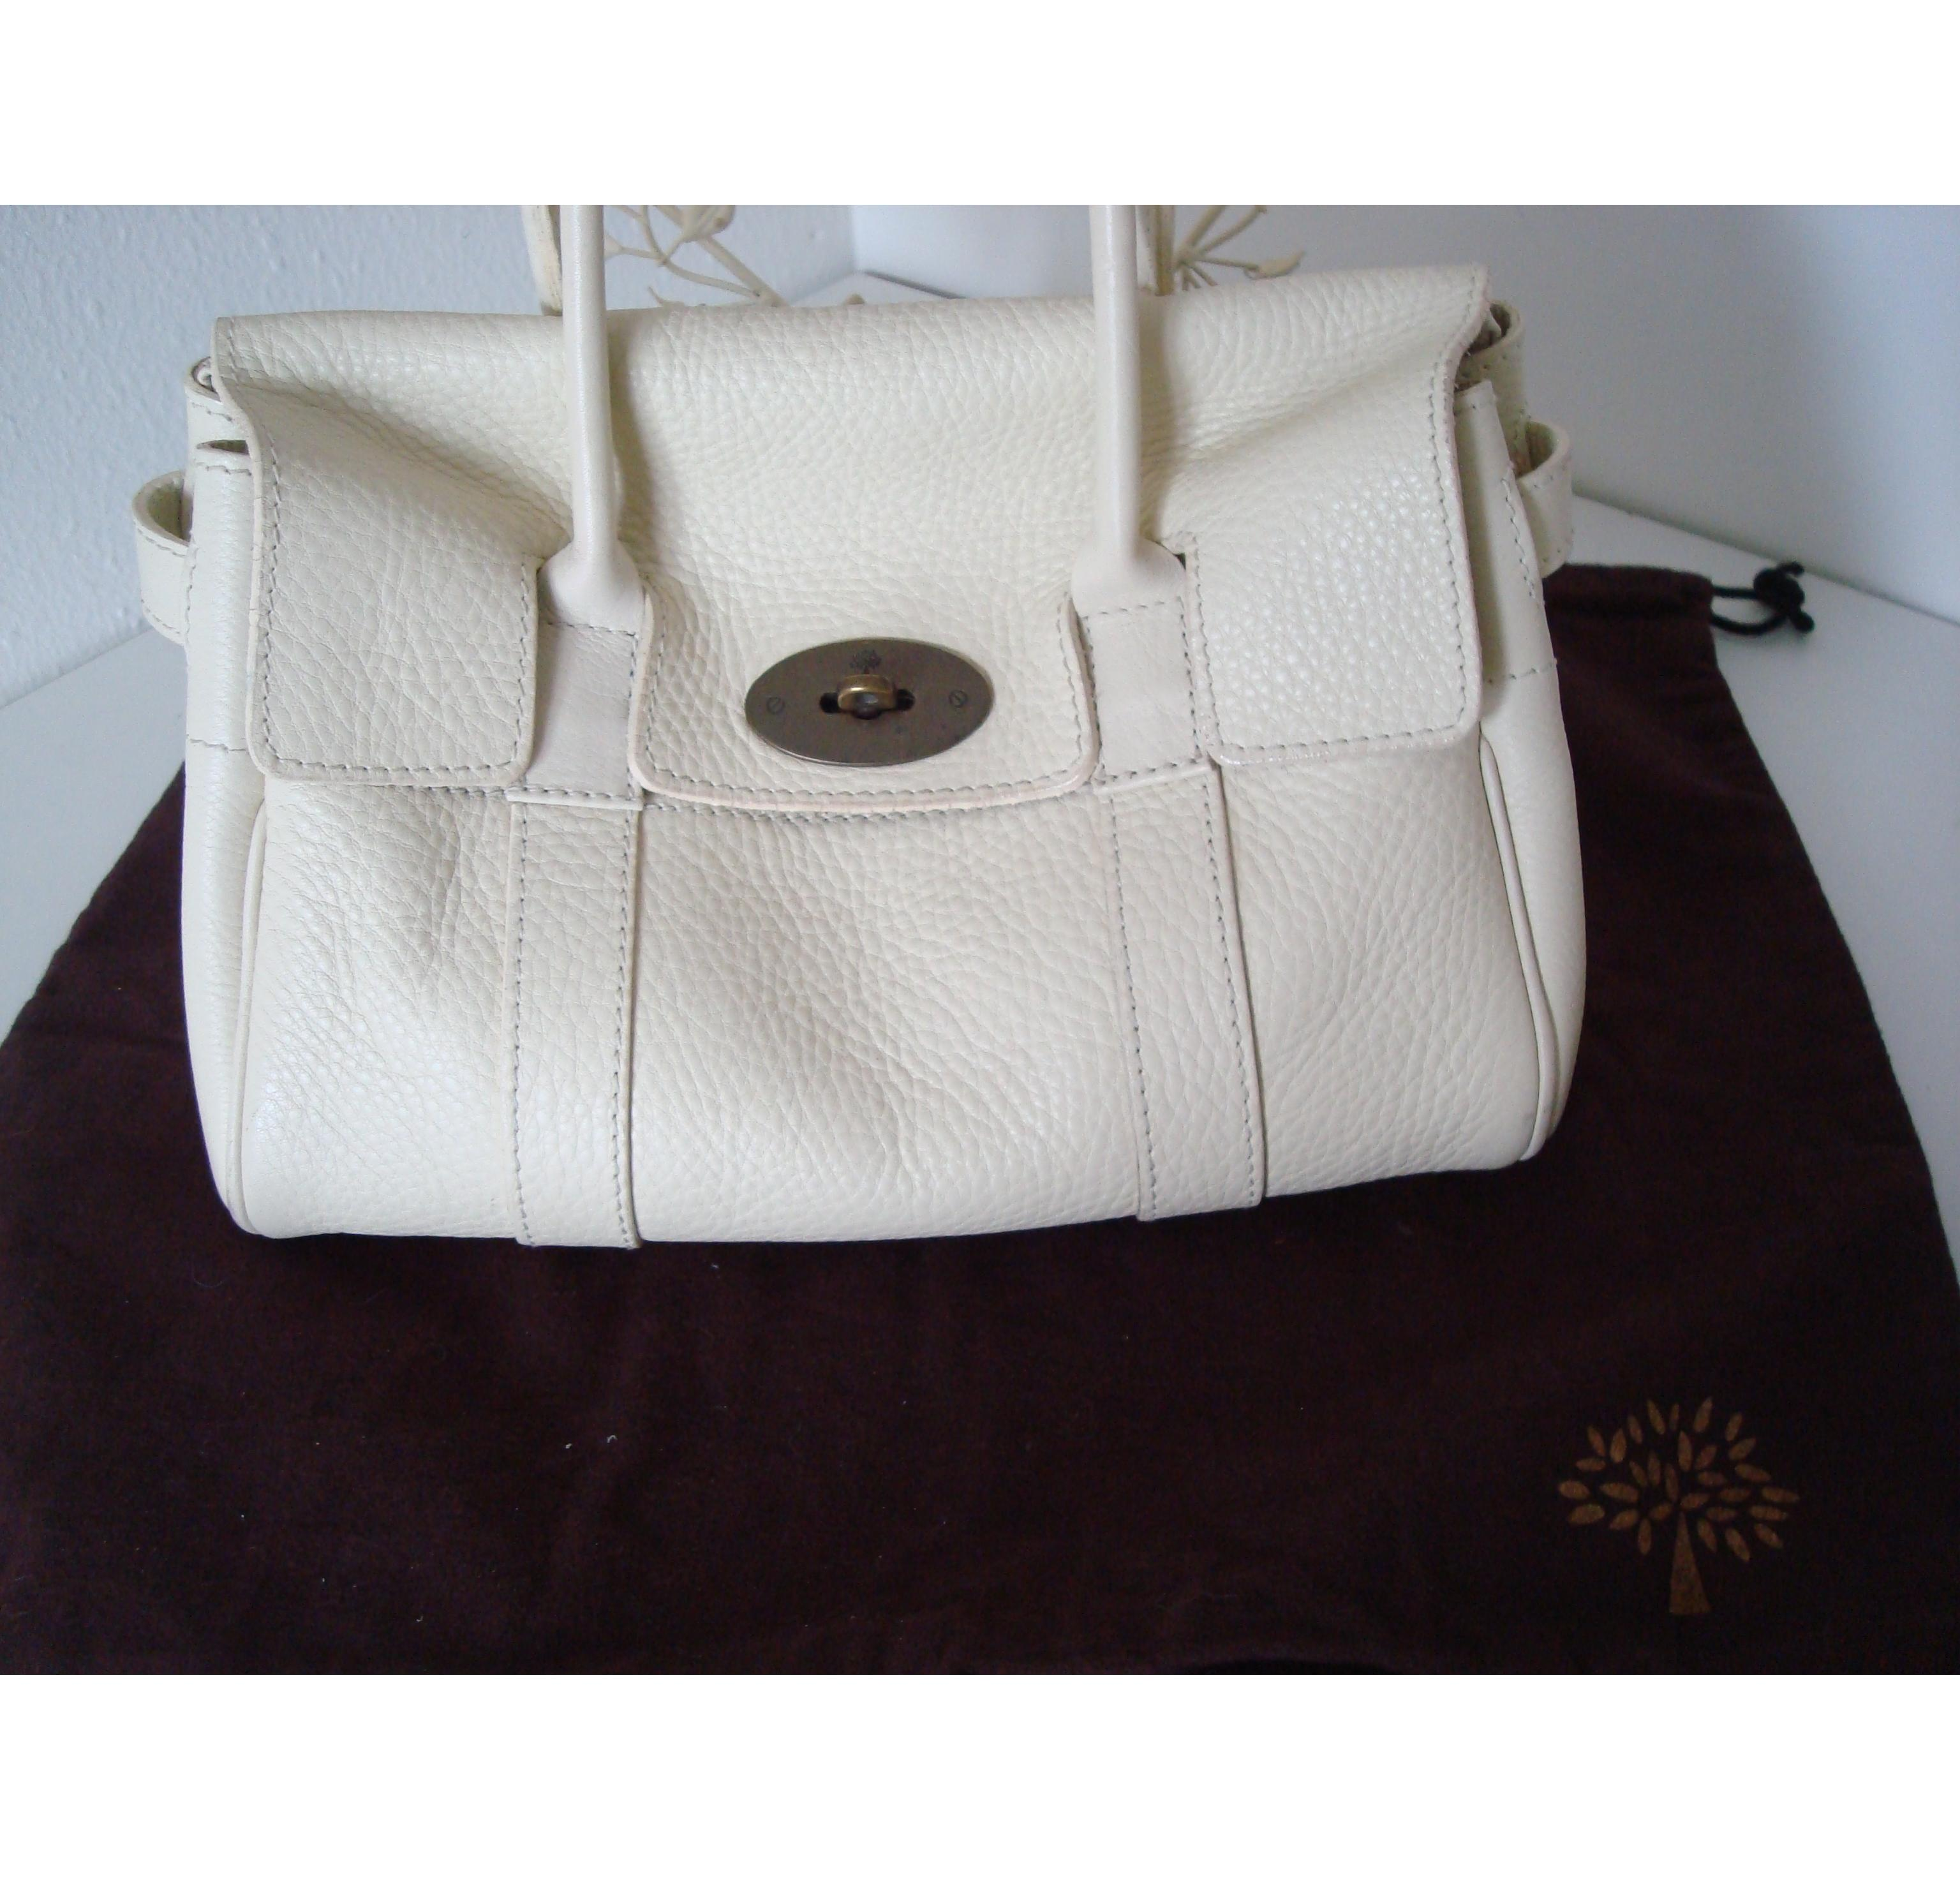 ... inexpensive mulberry cream pebble leather ledbury handbag hewi london  a471d f4787 4b8982403e5a4